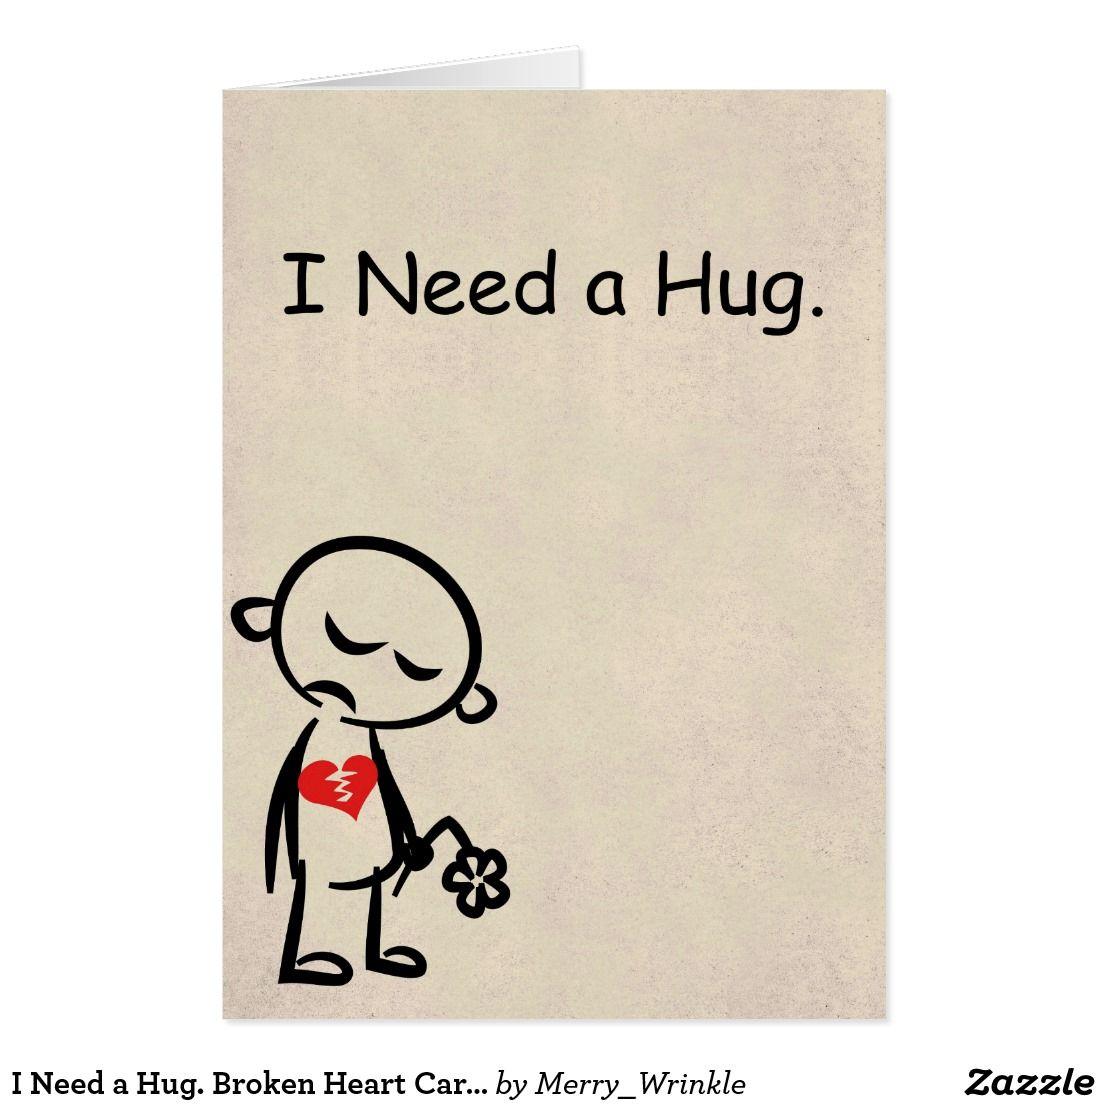 I Need A Hug Broken Heart Card Zazzle Com In 2021 Sorry Cards Im Sorry Cards Broken Heart